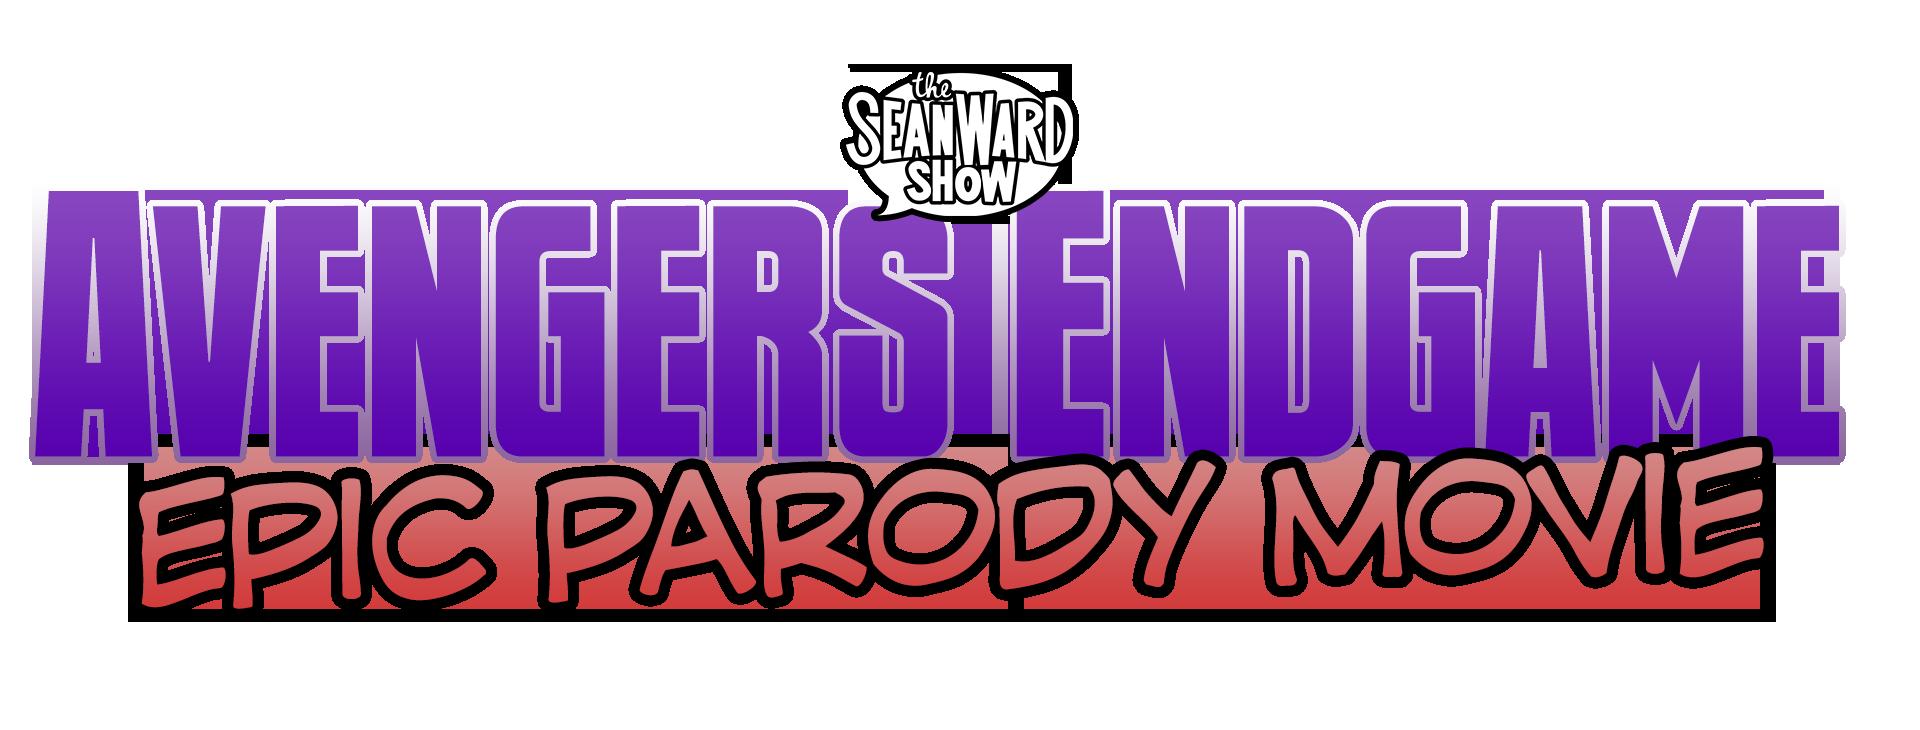 avengers endgame parody title